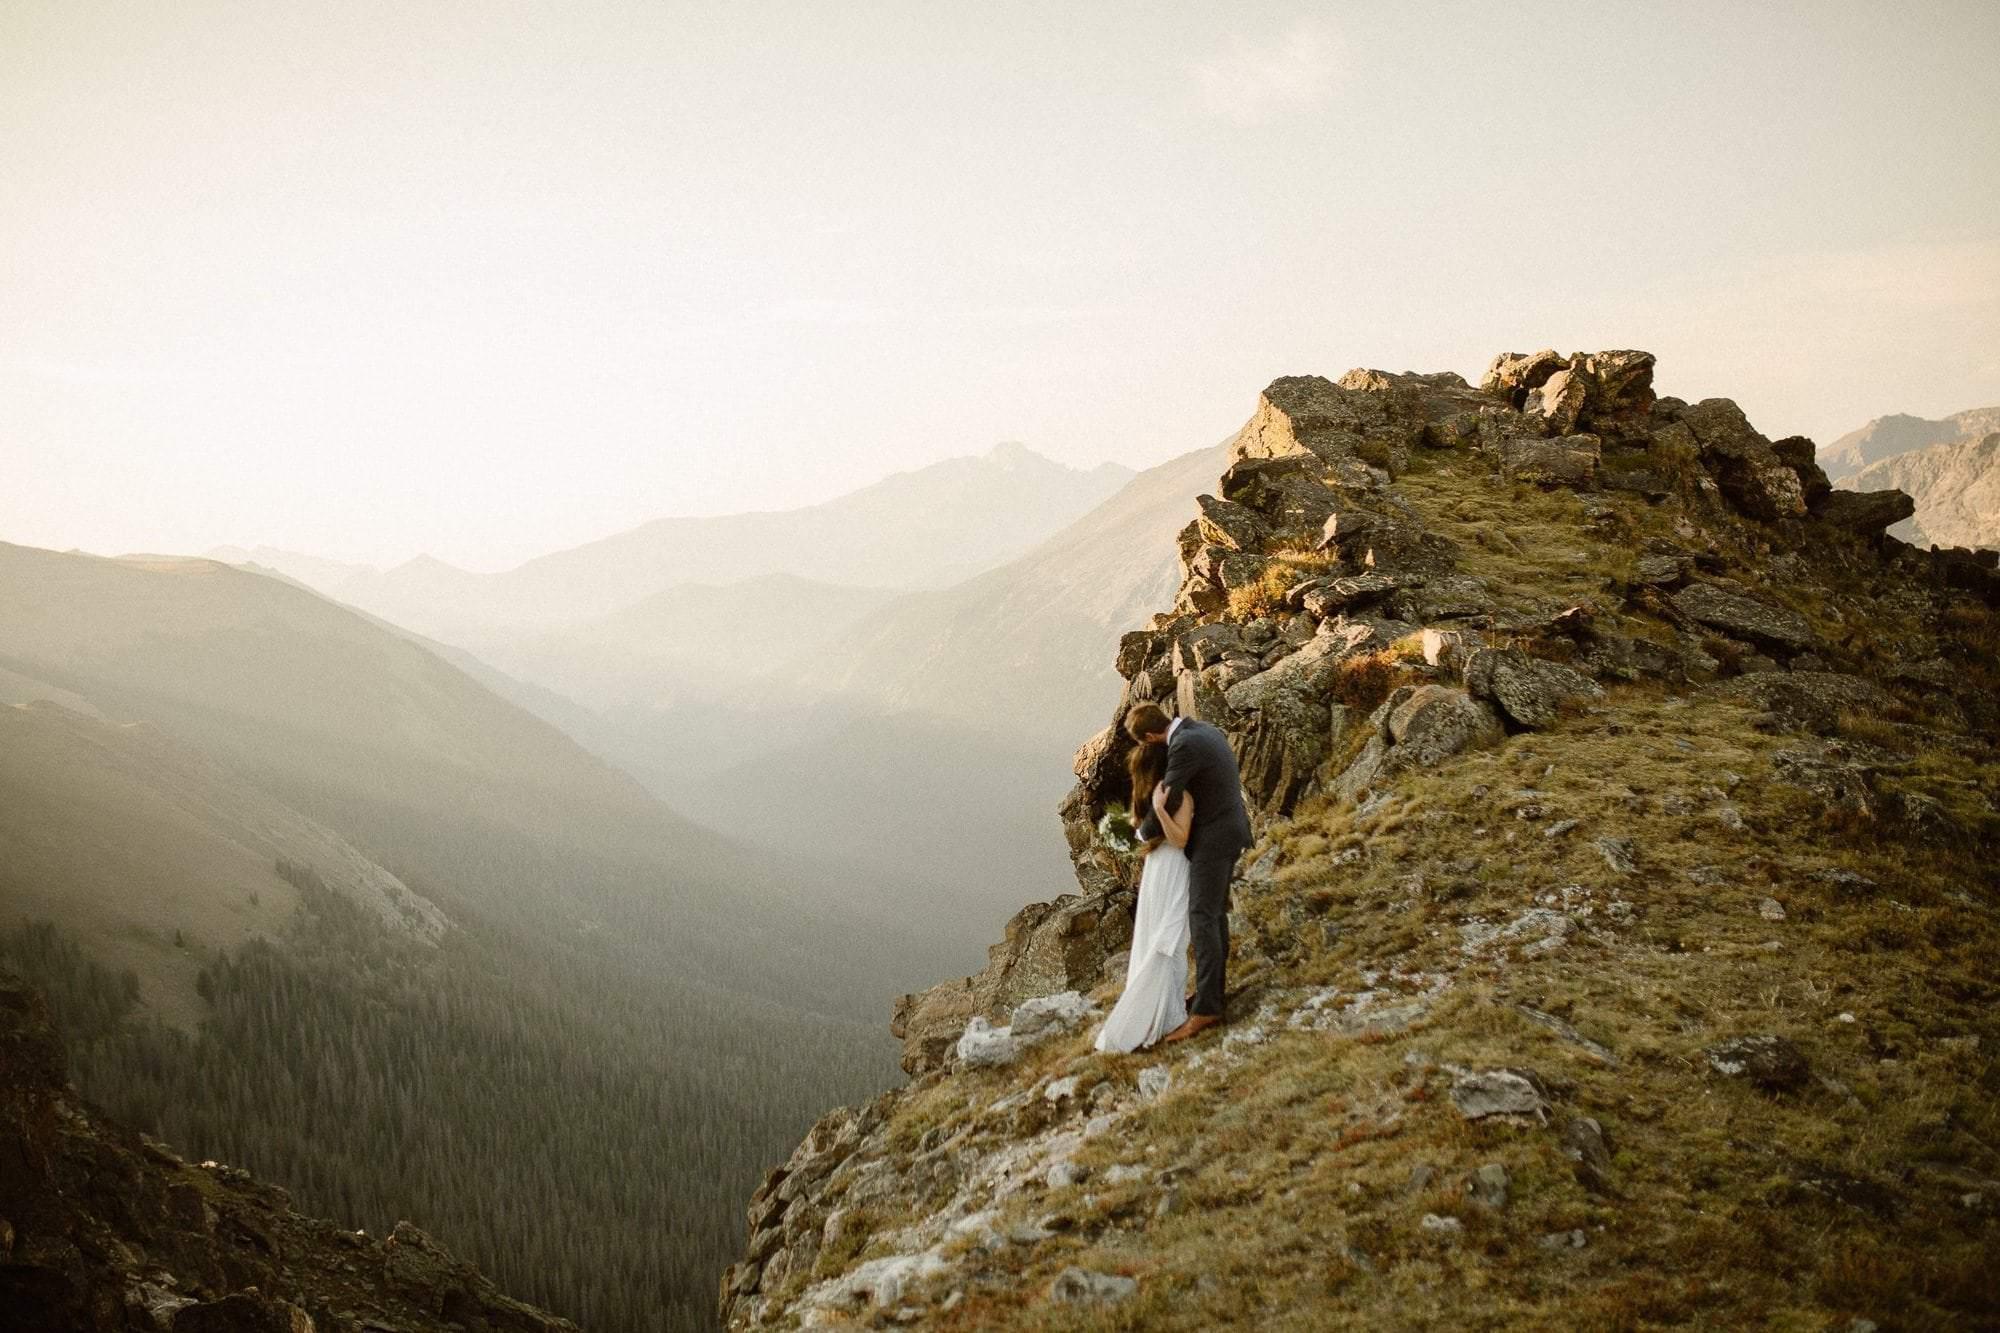 Colorado golden hour sunrise adventure session, Colorado Intimate Weddings and Adventure Elopement Photographer | Rocky Mountain National Park Wedding Photographer | Adventure